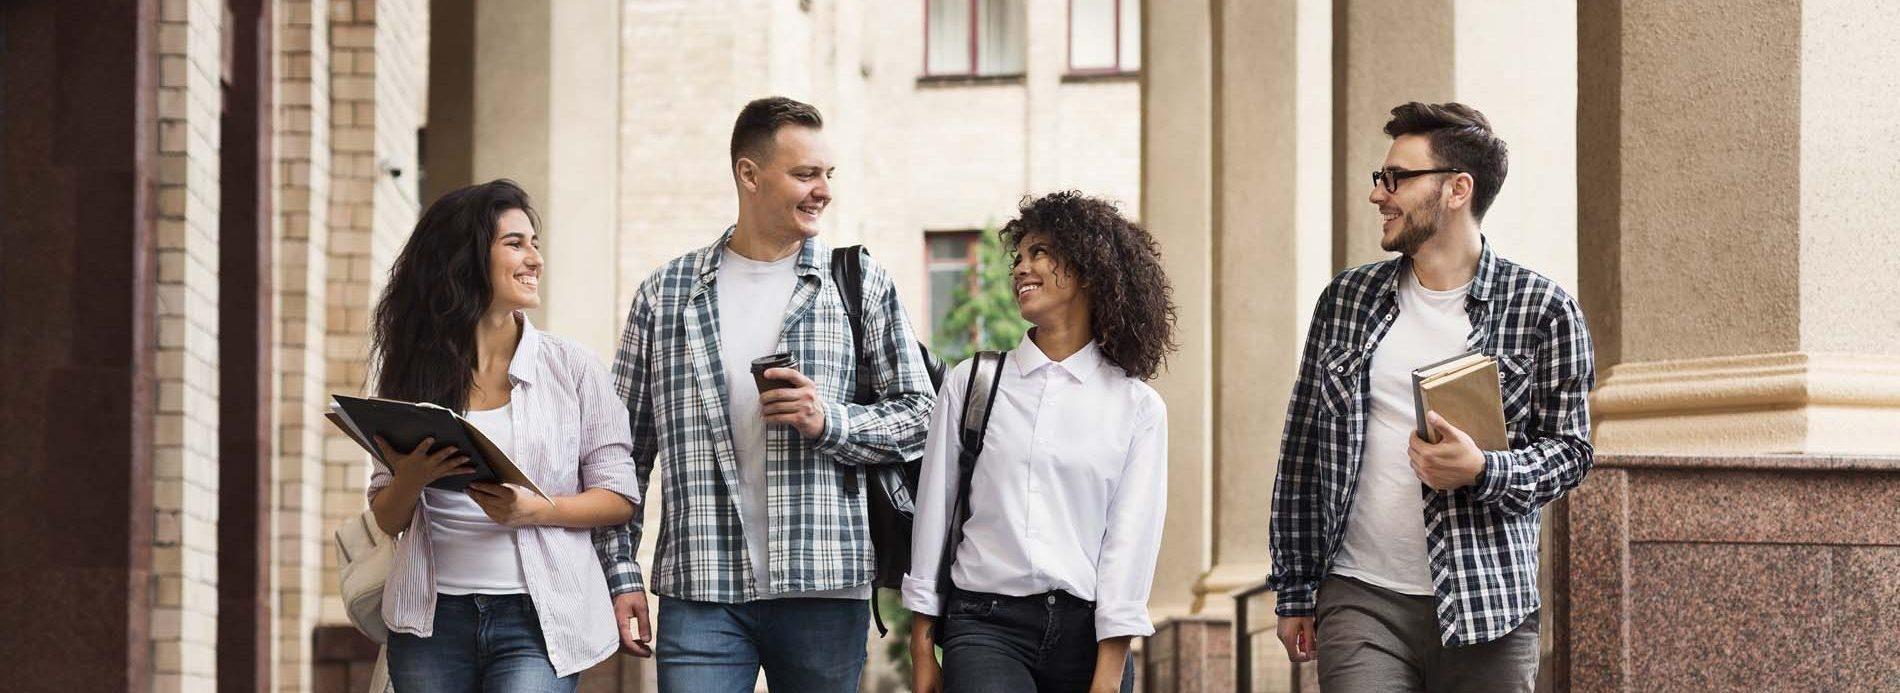 Group of students walking at campus